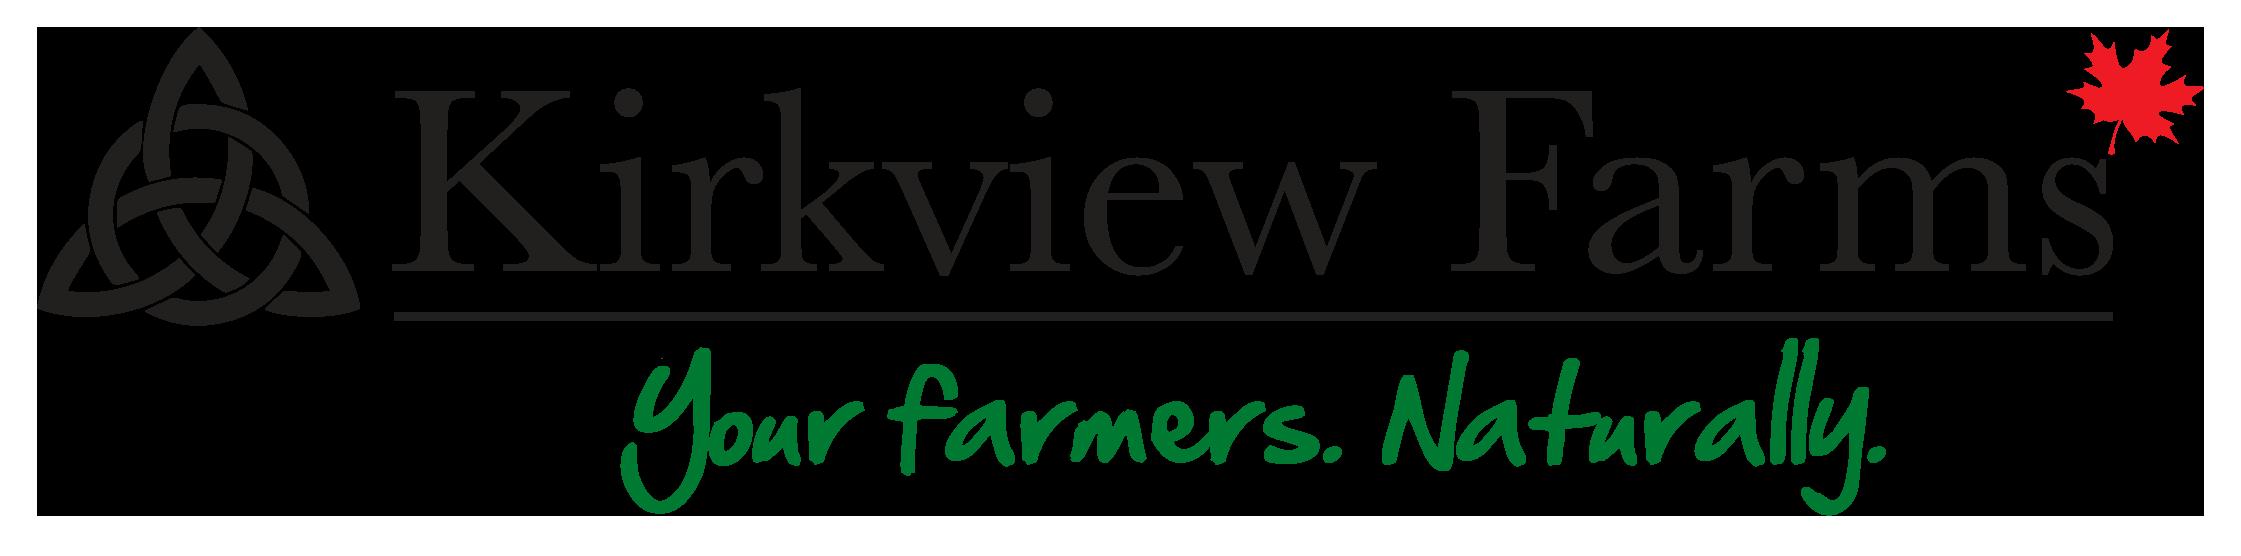 Kirkview Farms